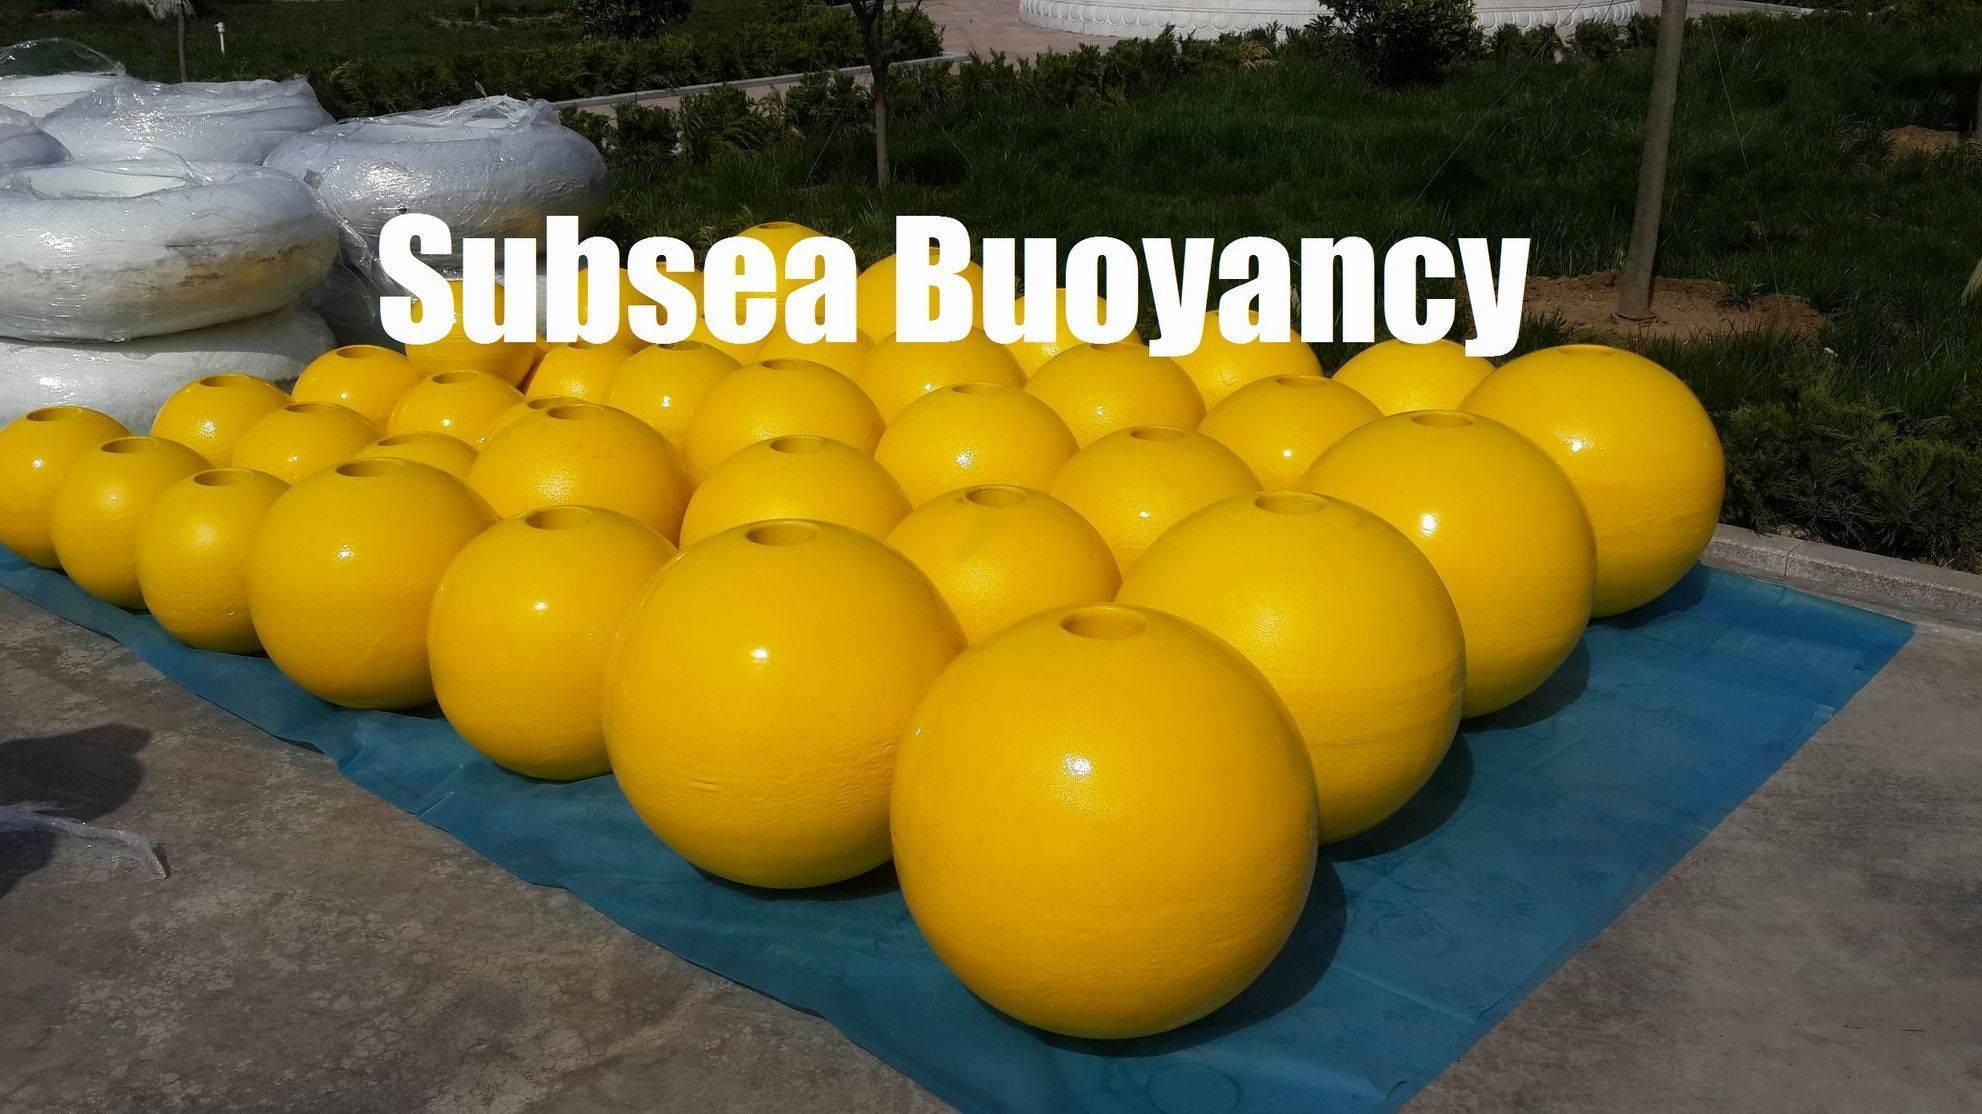 Subsea Buoy, operating depths of exceeding 6000 meters